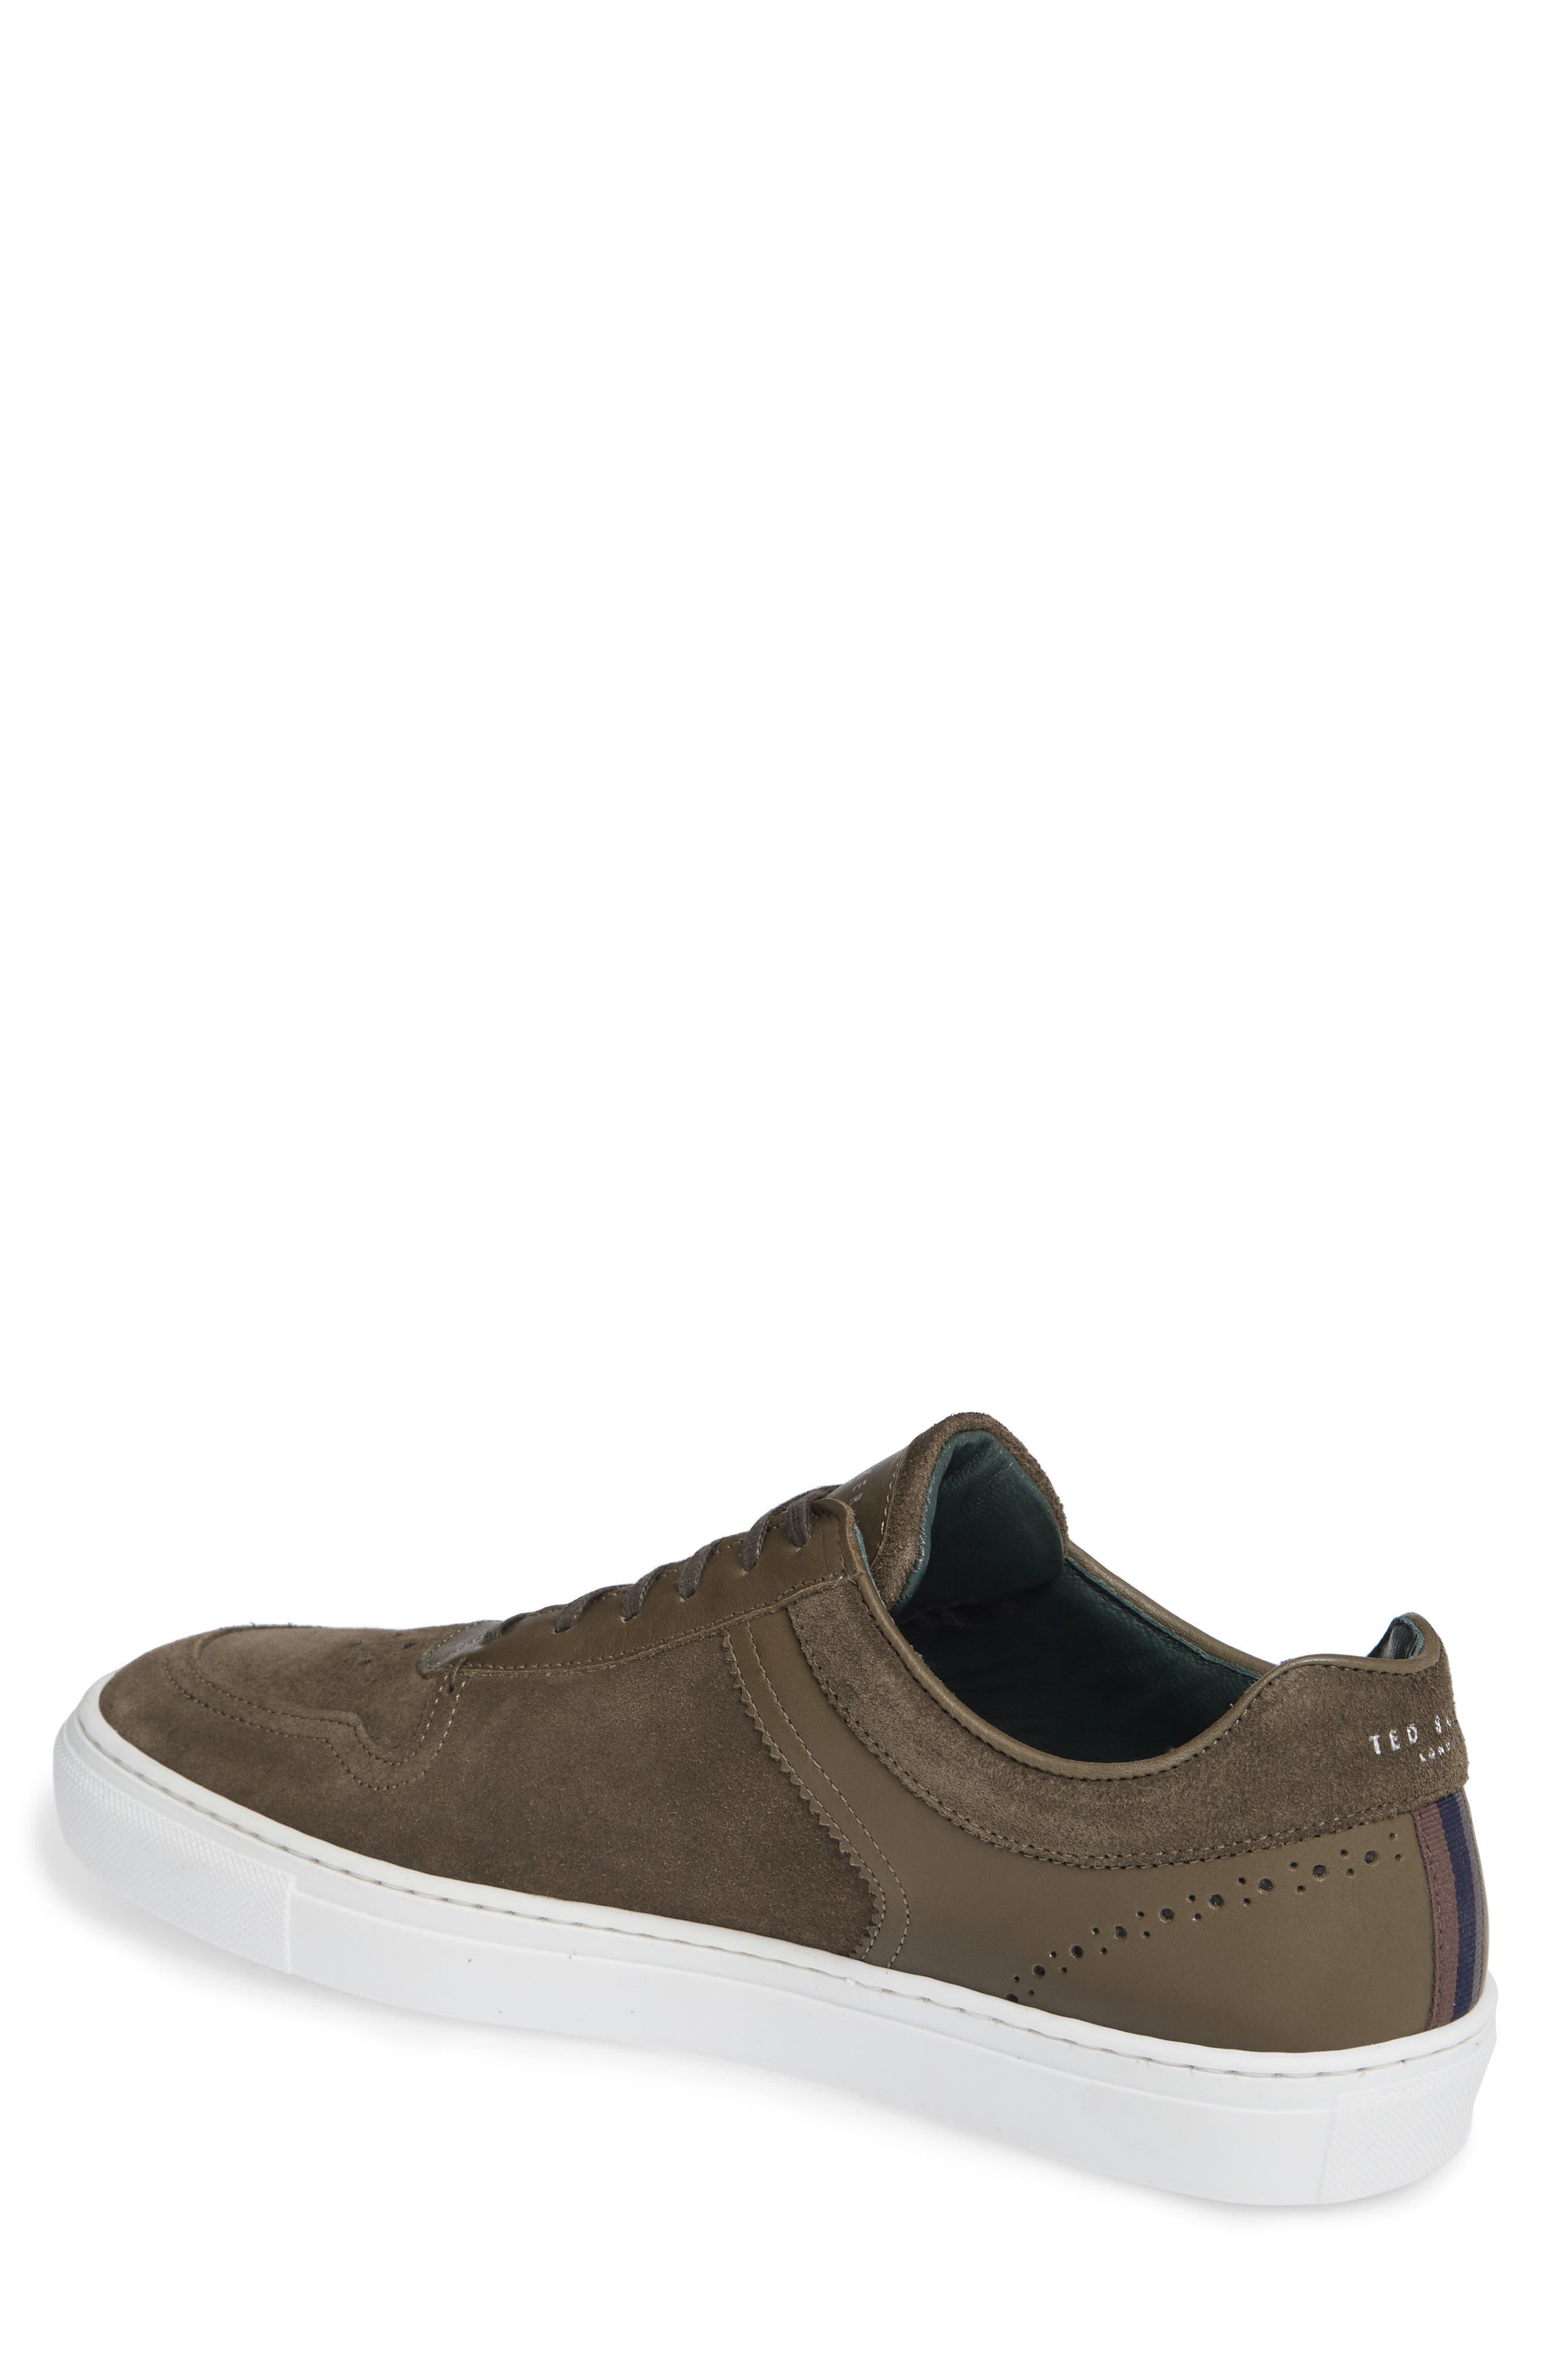 Burall Sneaker,                             Alternate thumbnail 2, color,                             DARK GREEN SUEDE